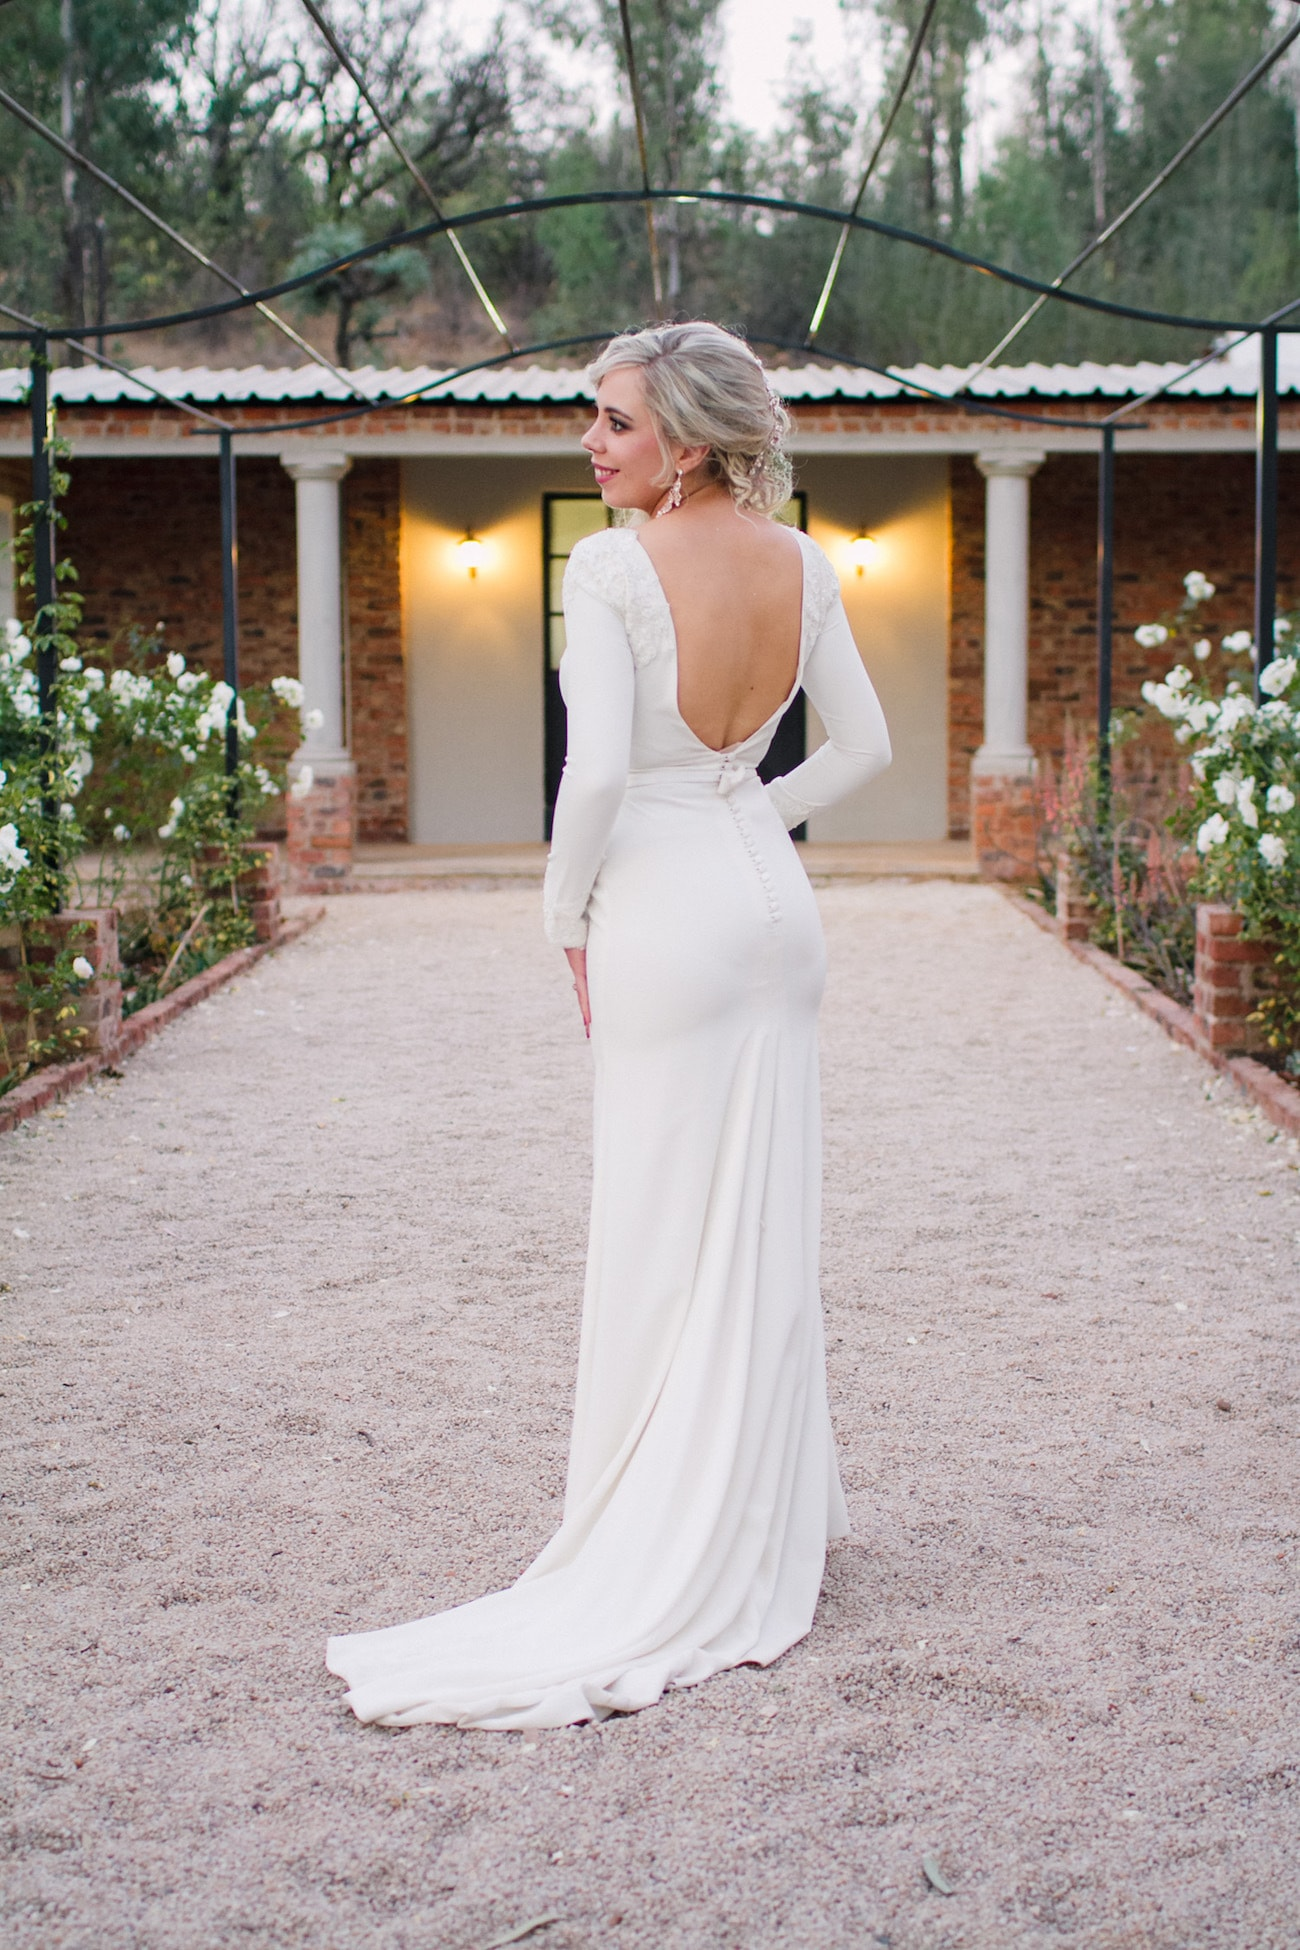 Winter Wedding Dress | Joyous Jewel Tone Winter Wedding | Credit: Dust and Dreams Photography